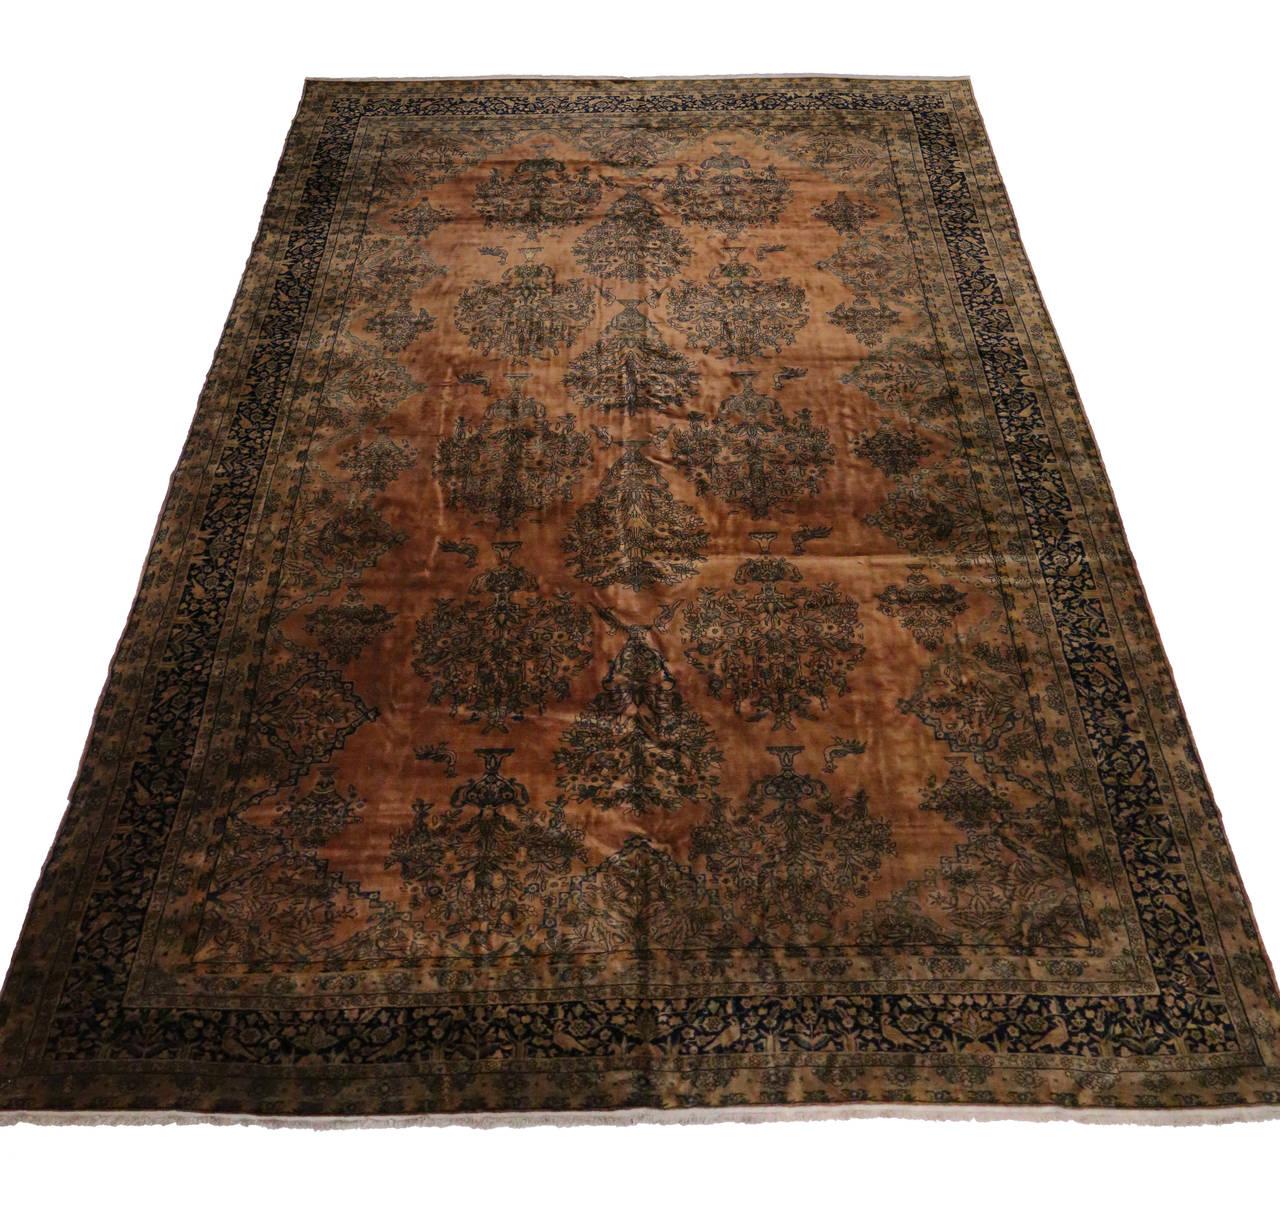 Antique Persian Kashan Kork Manchester Wool With Art